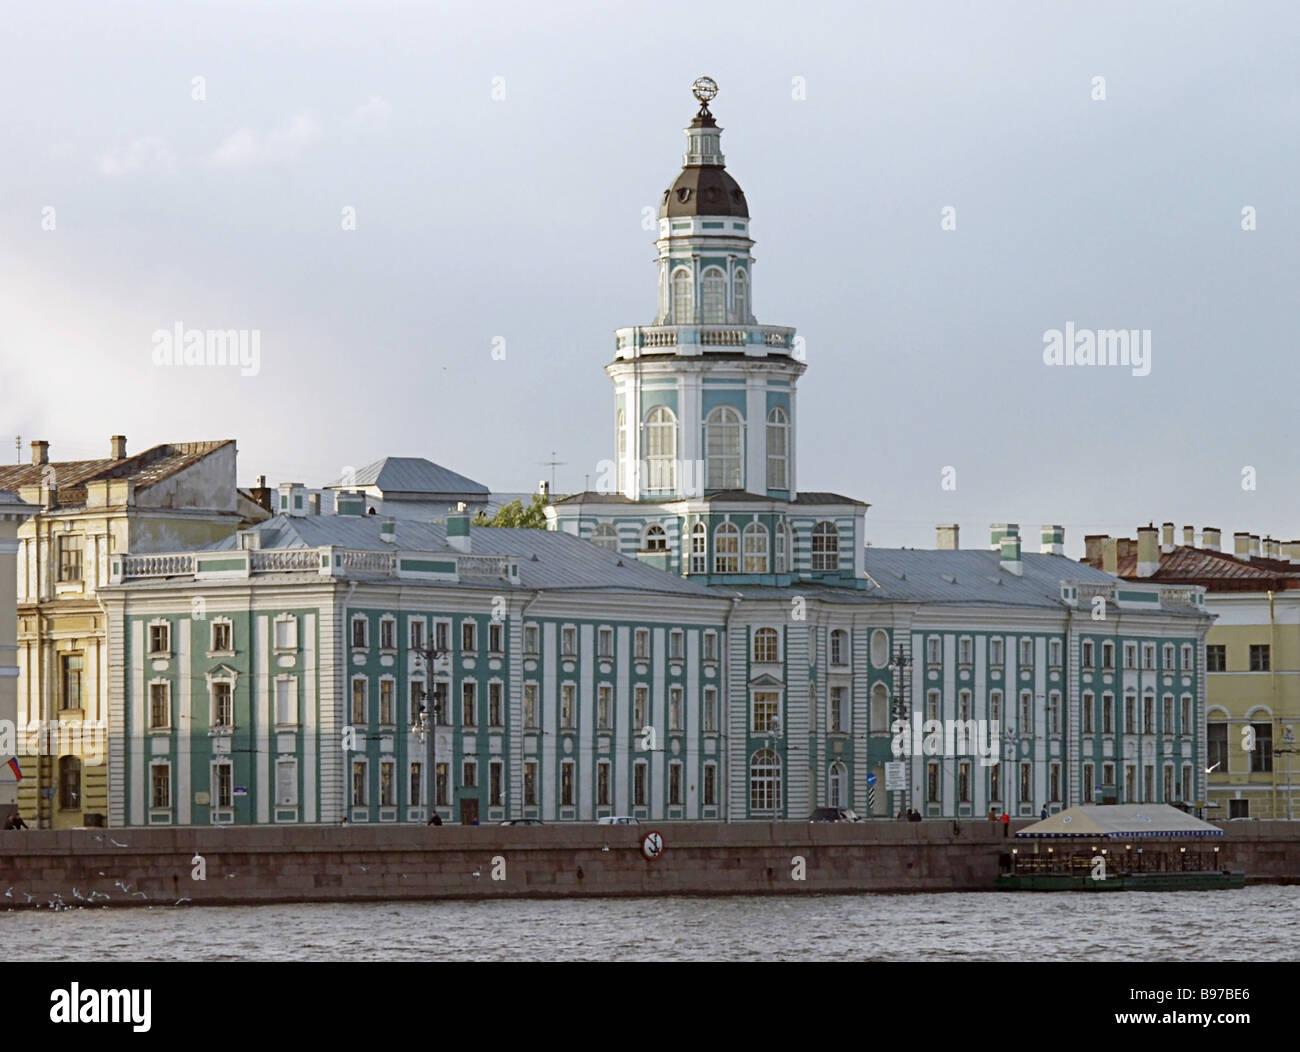 Kunstkamera Cabinet of Curiosities in the Neva s University Embankment St Petersburg Russia s first state run sciences - Stock Image